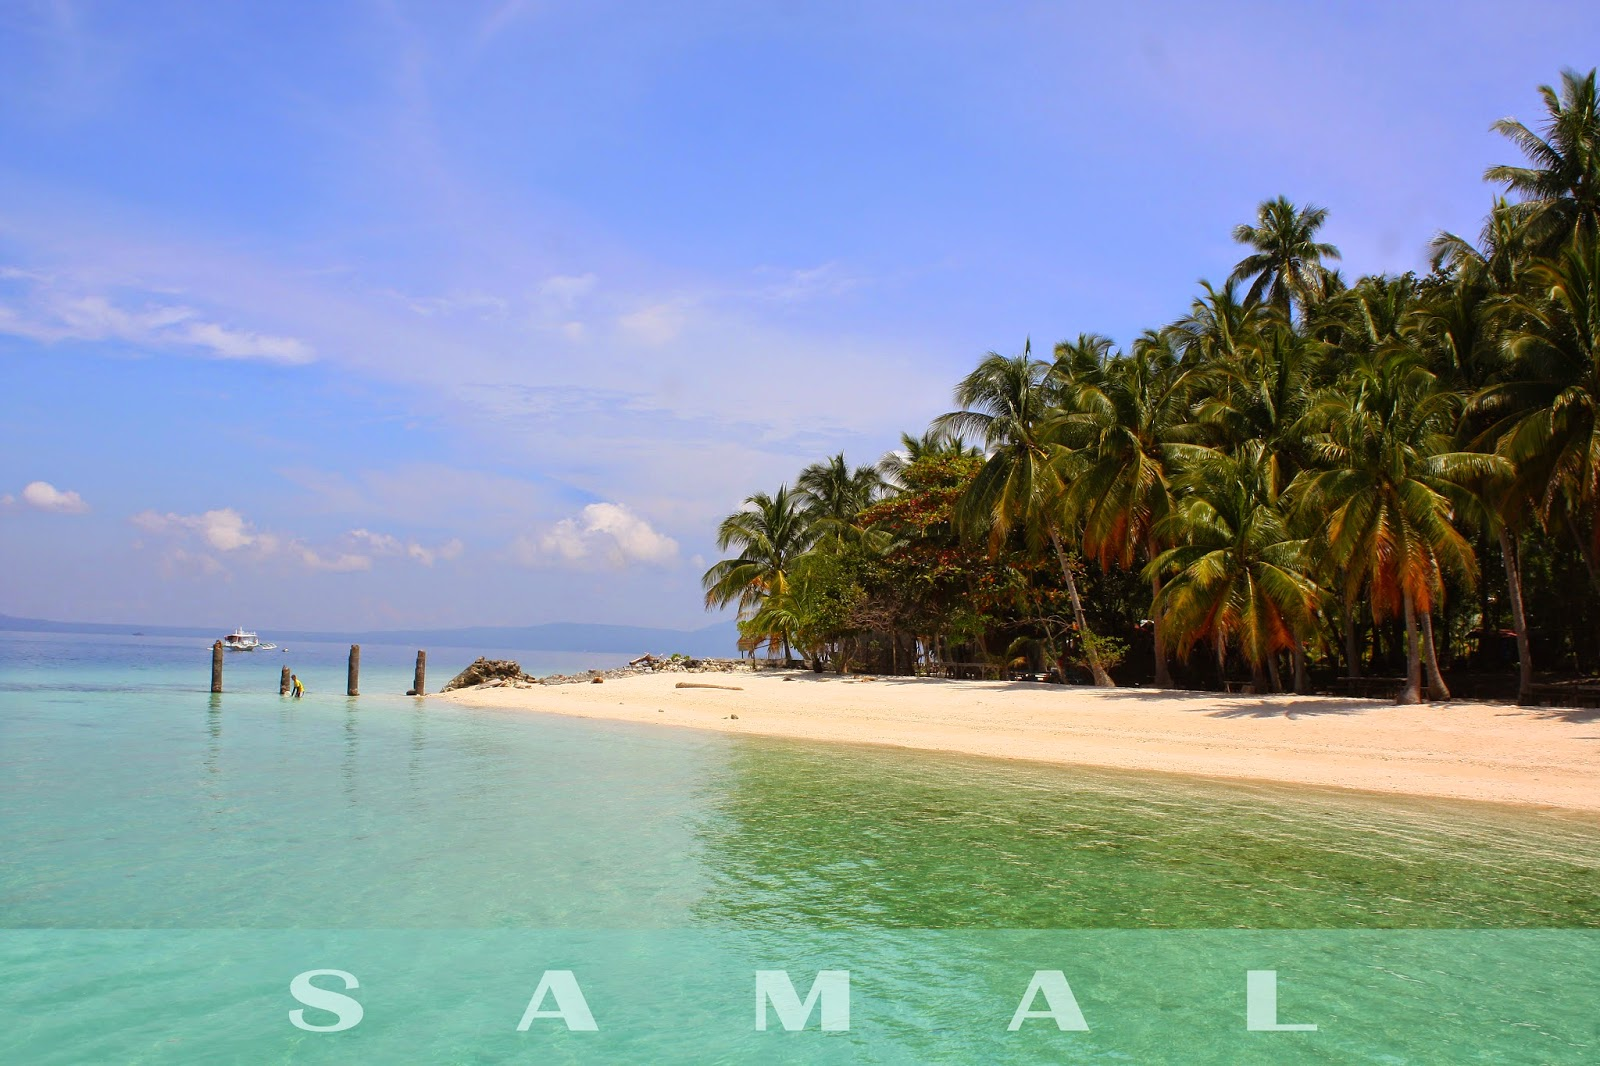 Babu Santa Beach Resort, a popular samal beach